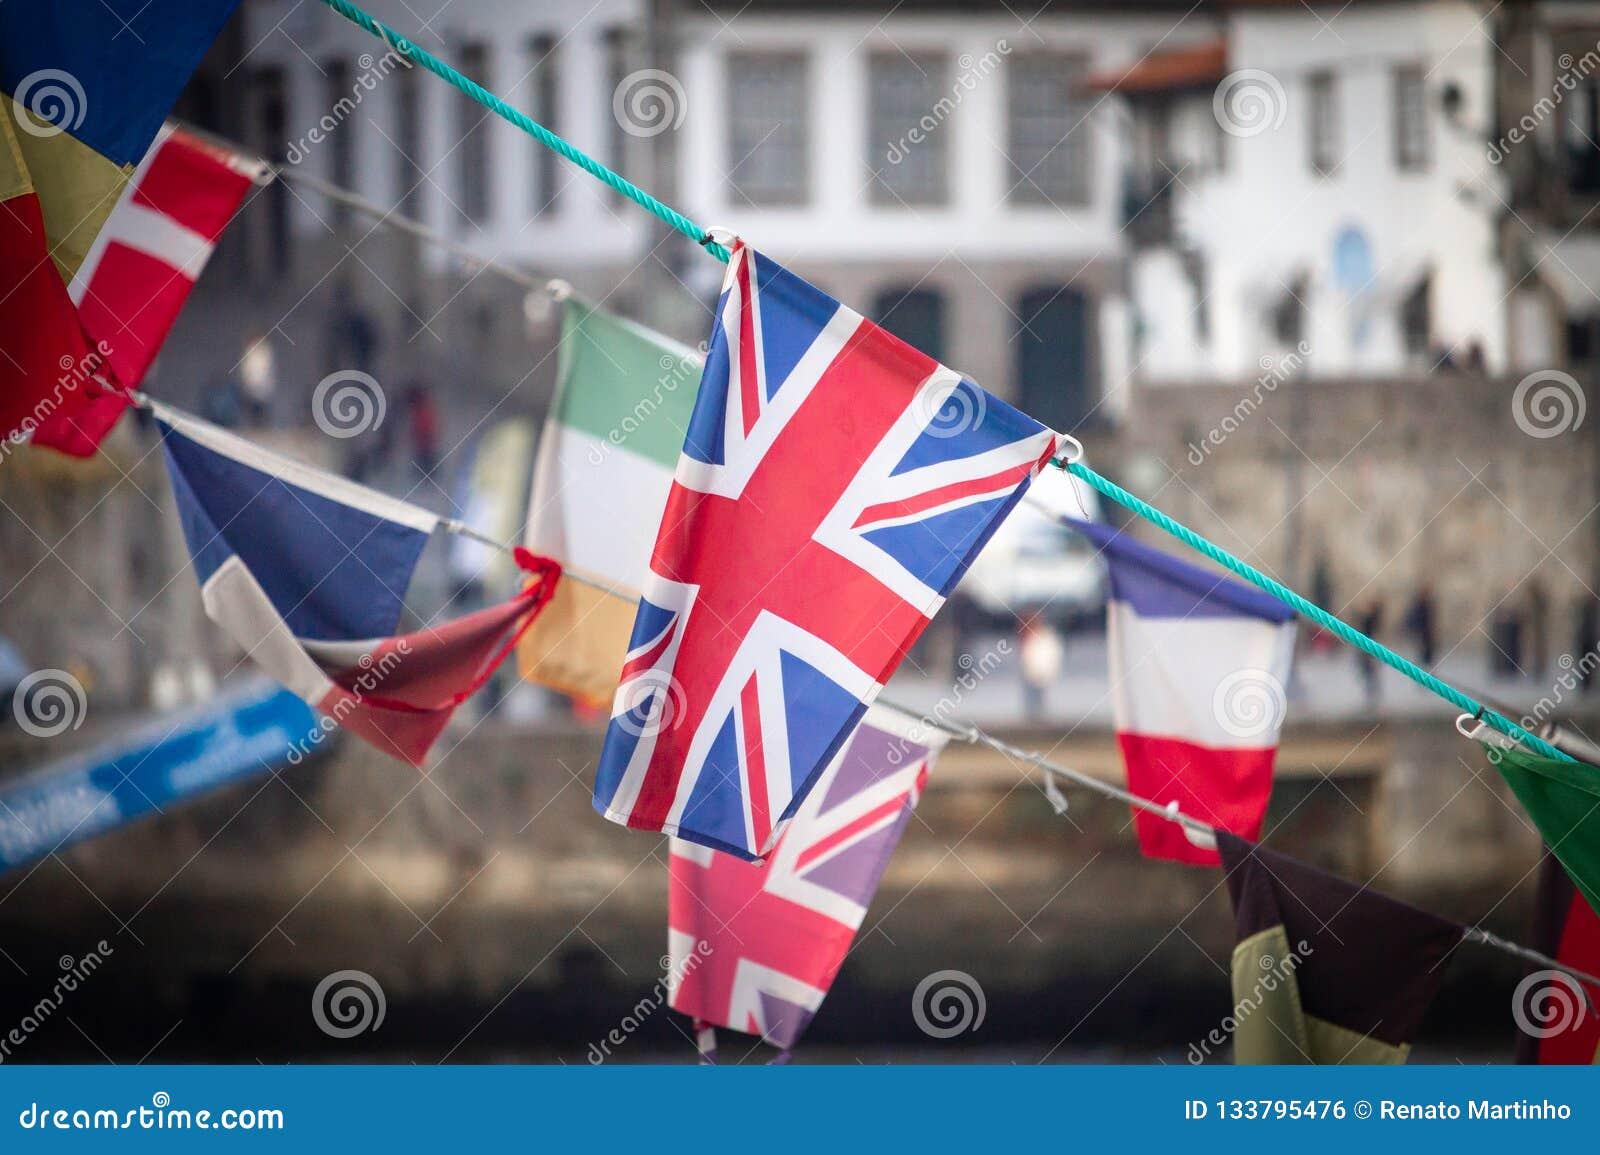 Великобританский флаг между другими флагами